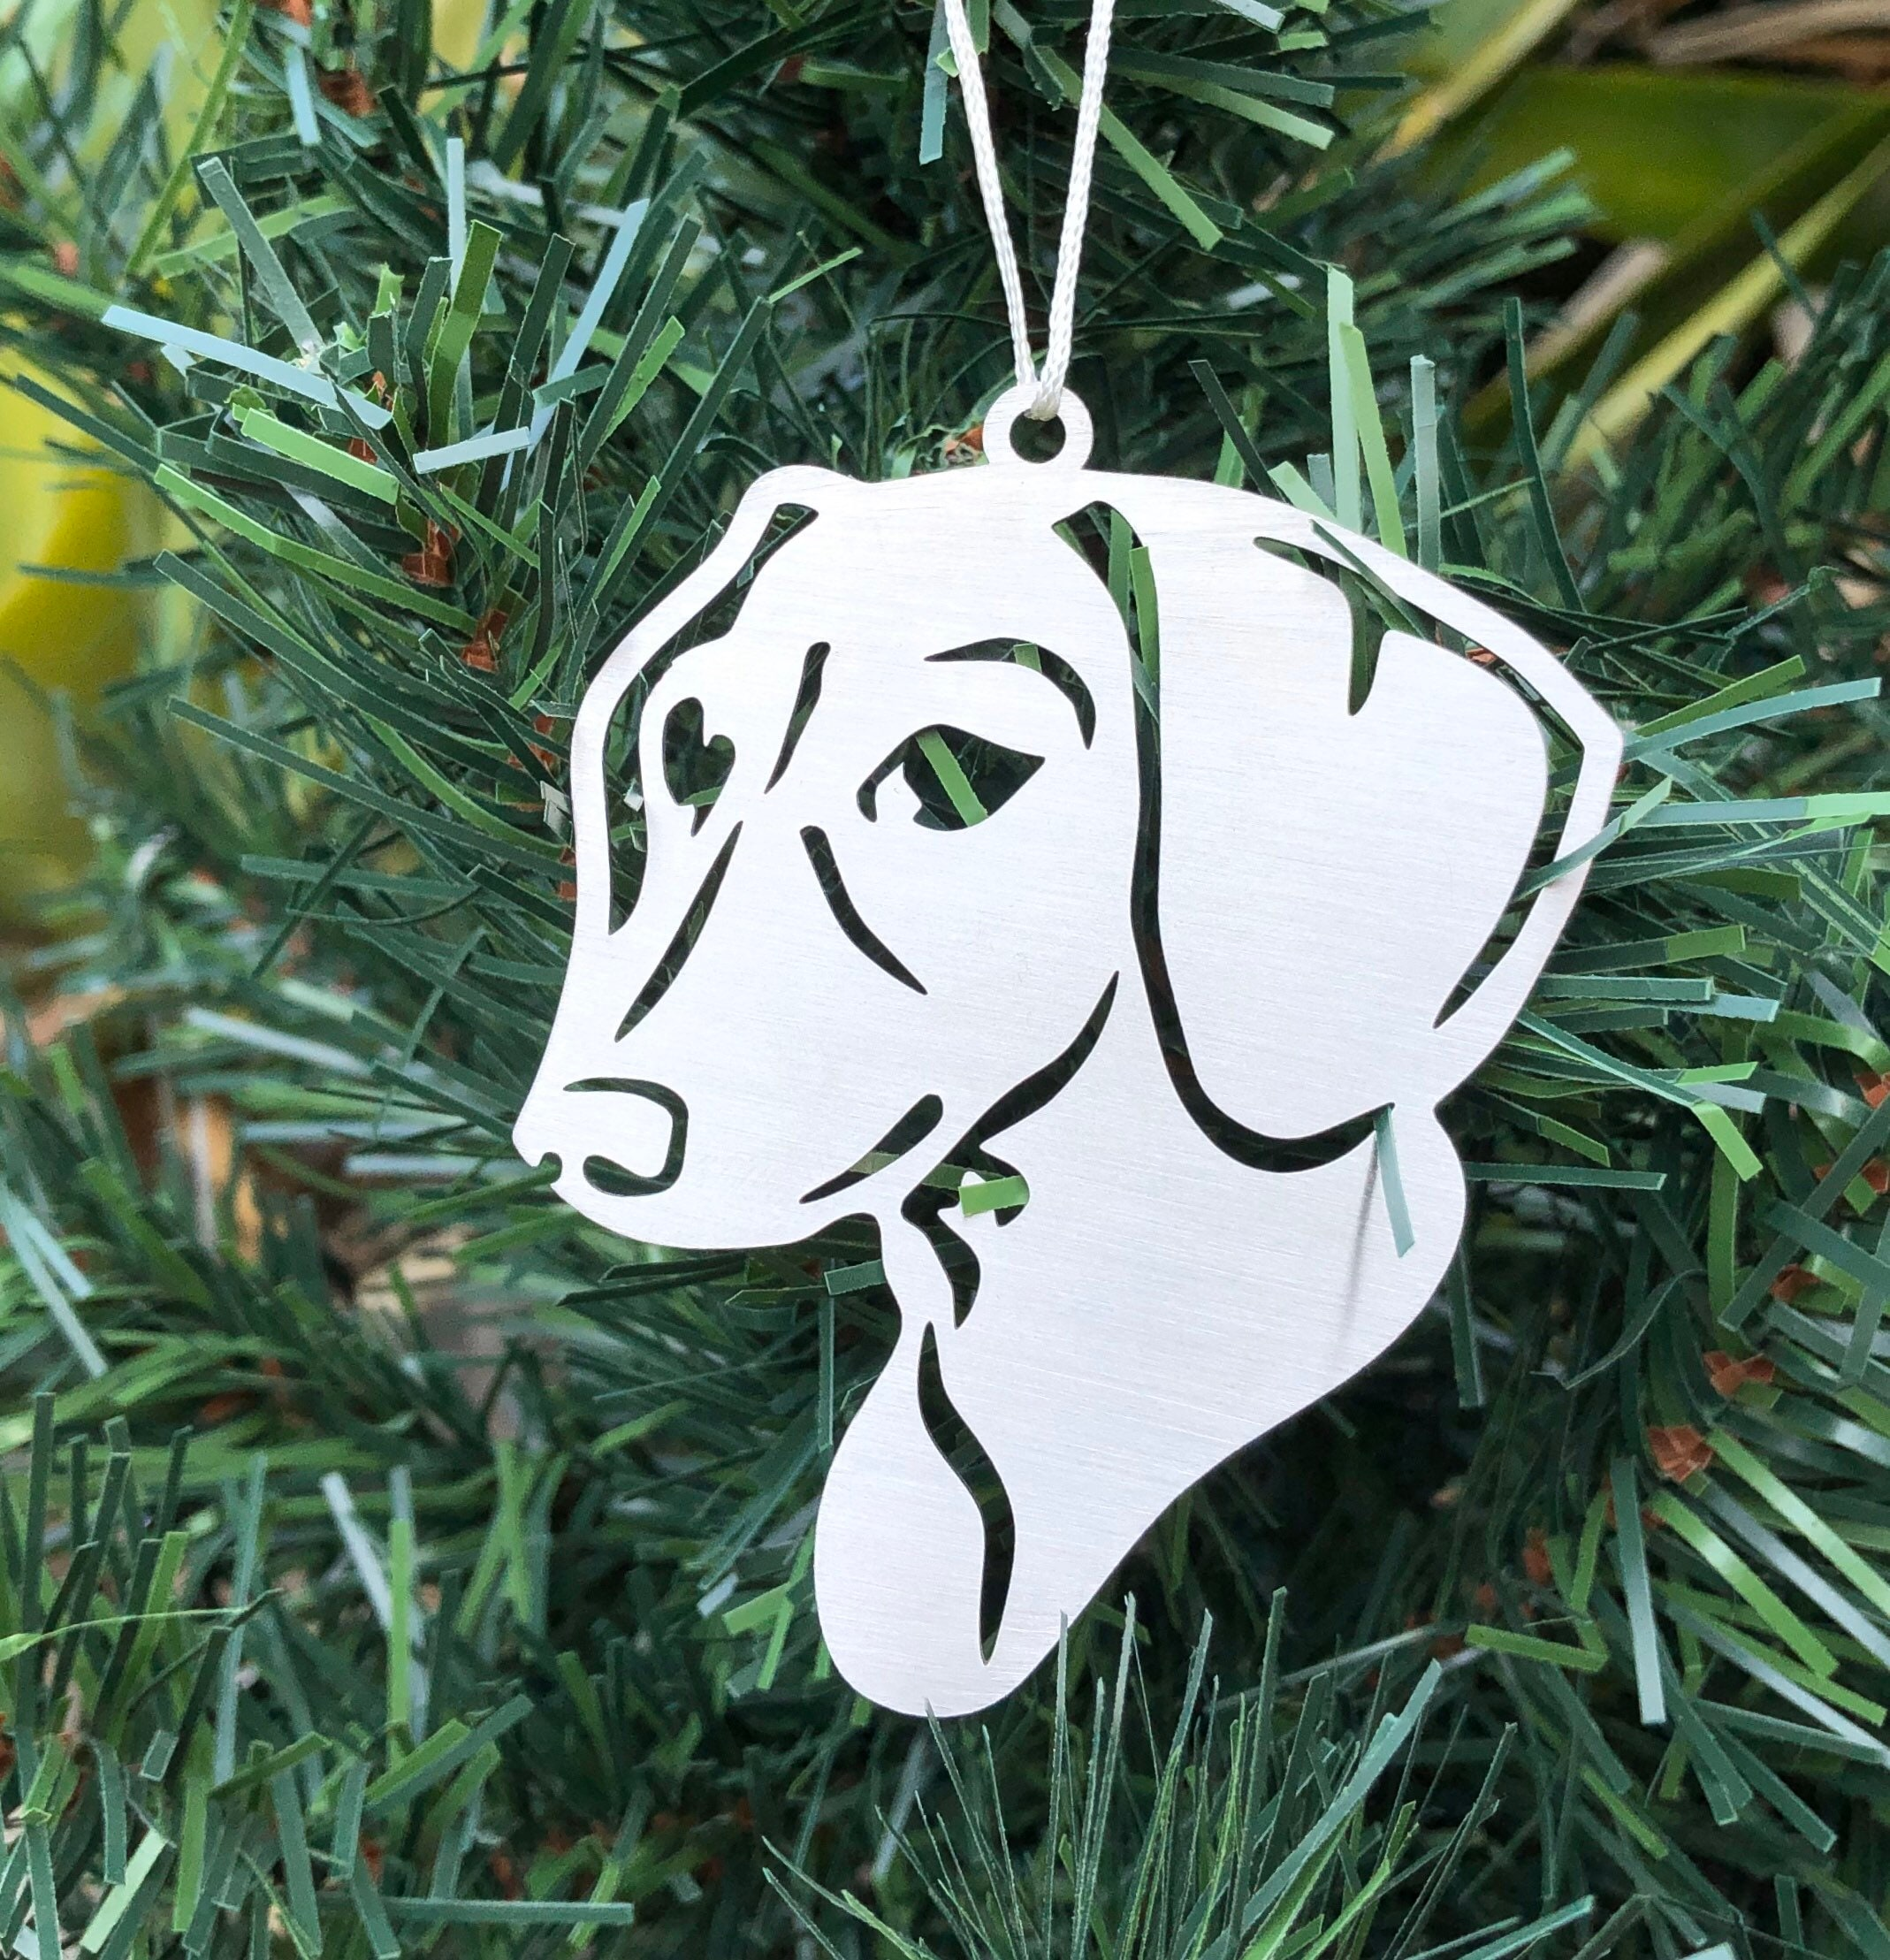 Dachshund Dog Stainless Steel Christmas Ornament Dachshund Dog Face Tree Ornament Xmas Hanging Decoration